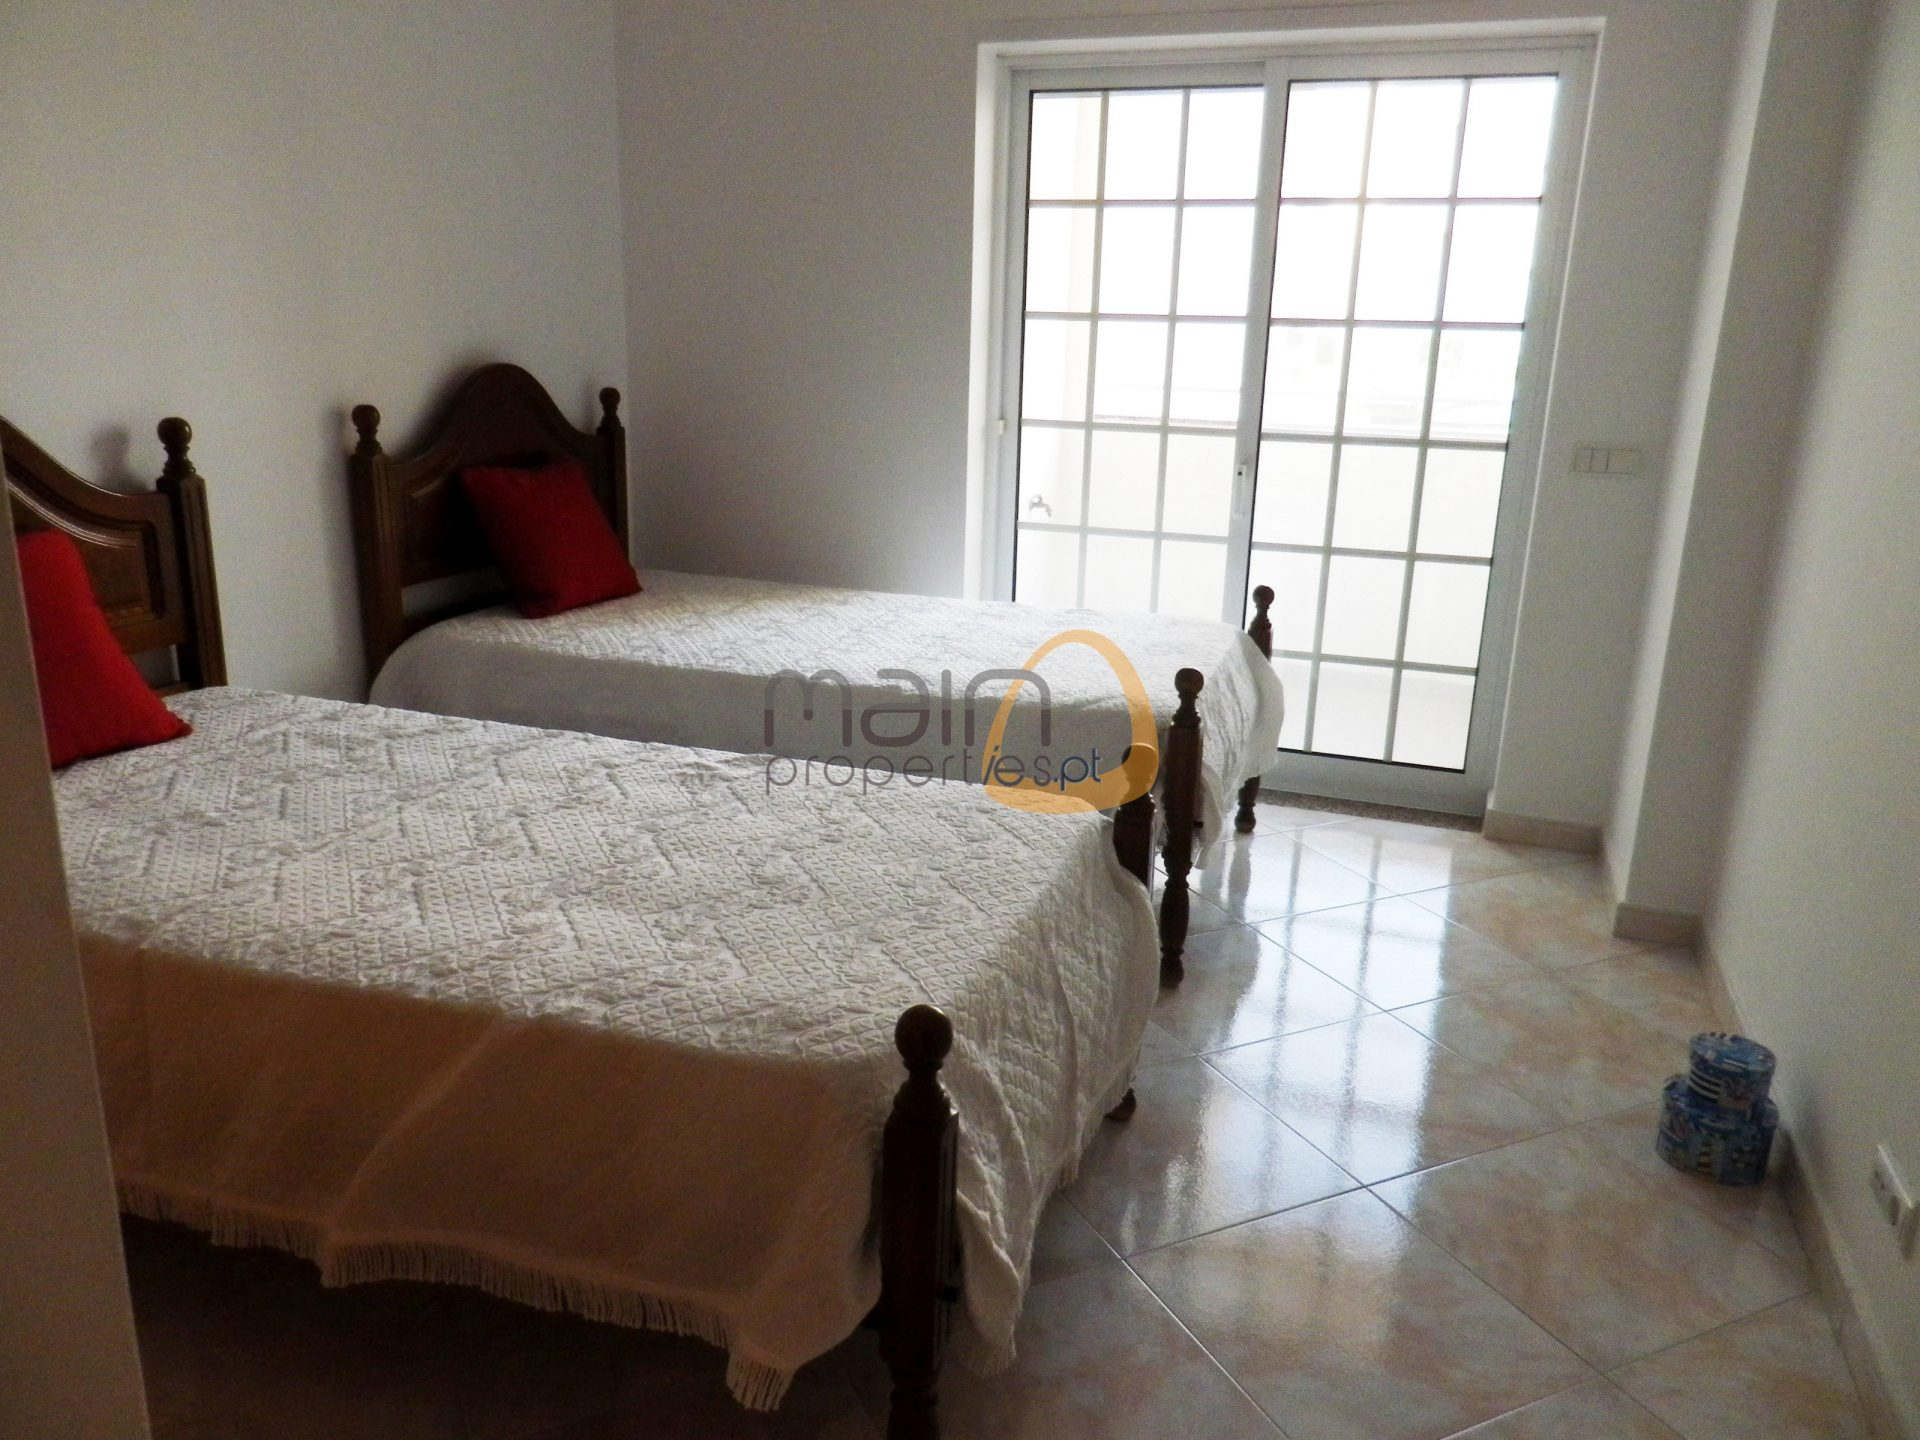 4 bedroom apartment faro_6